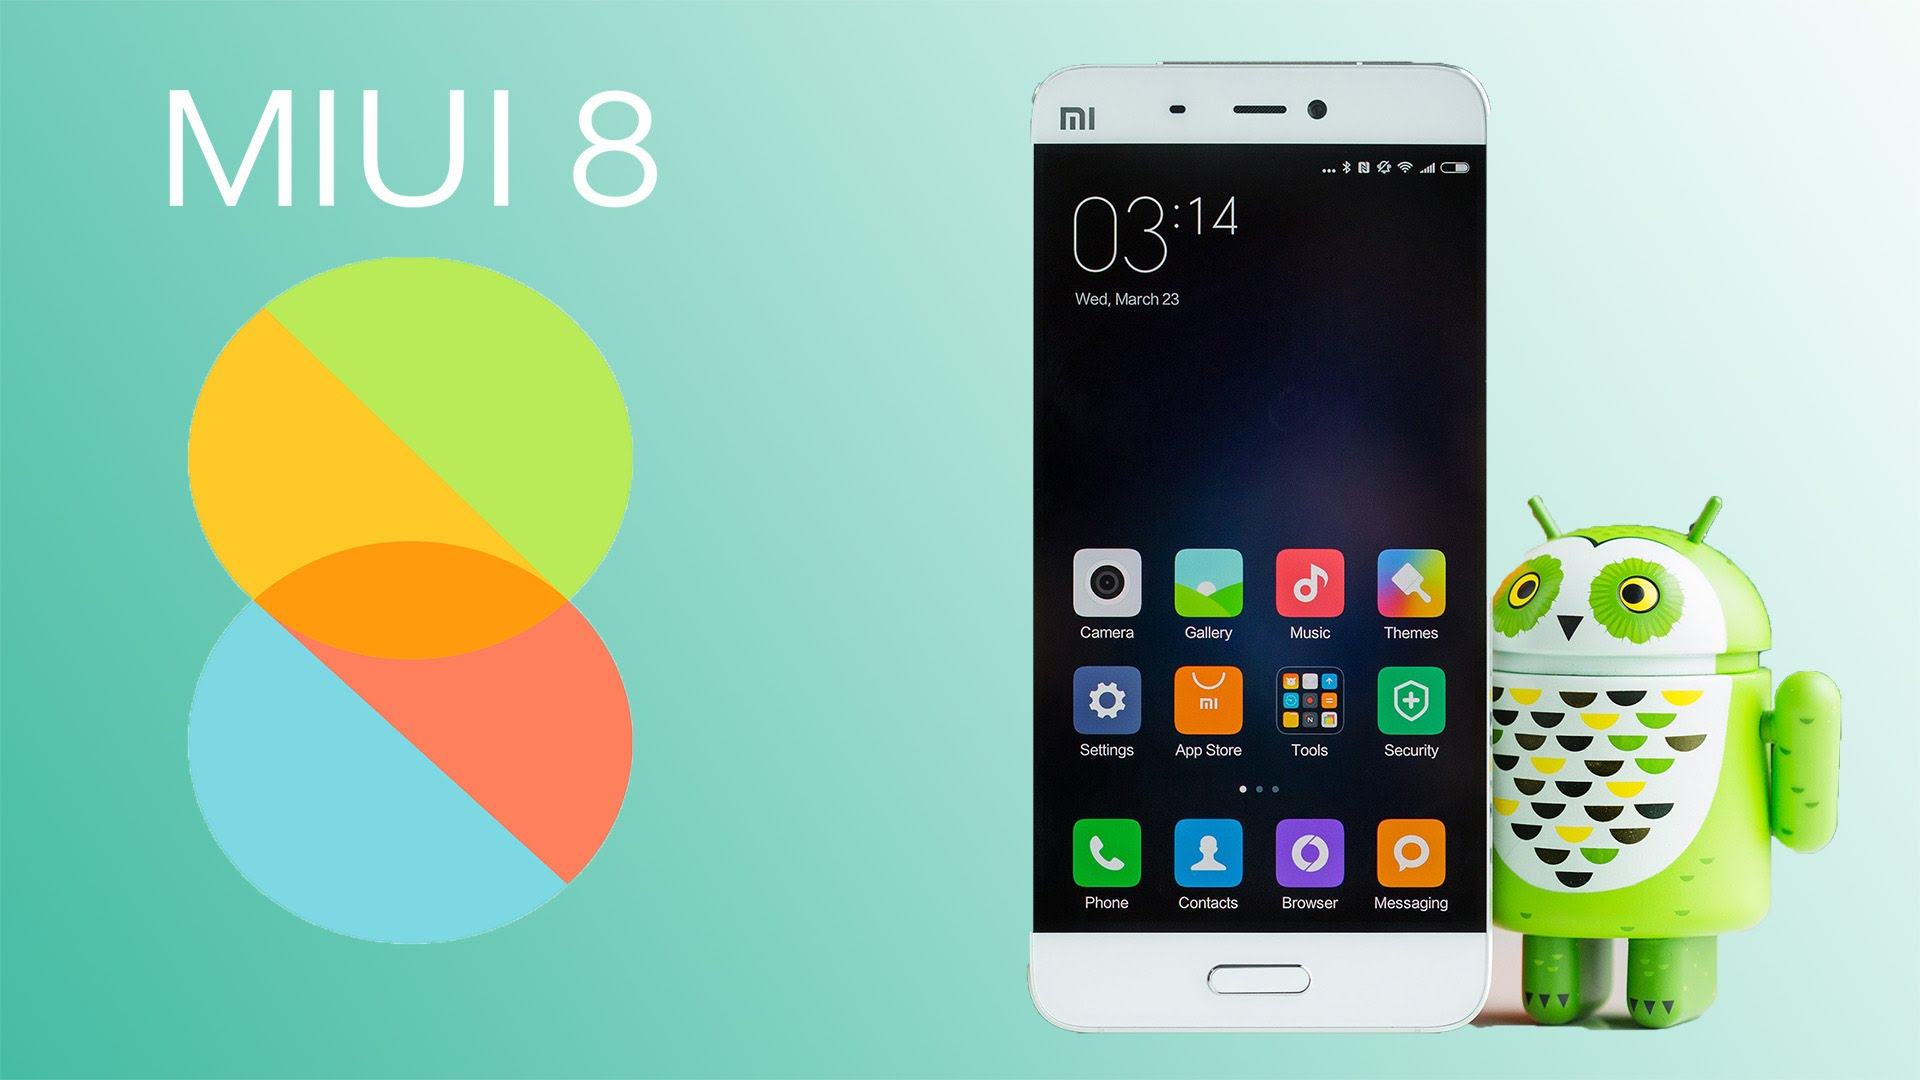 Xiaomi ya ofrece MIUI 8 oficialmente